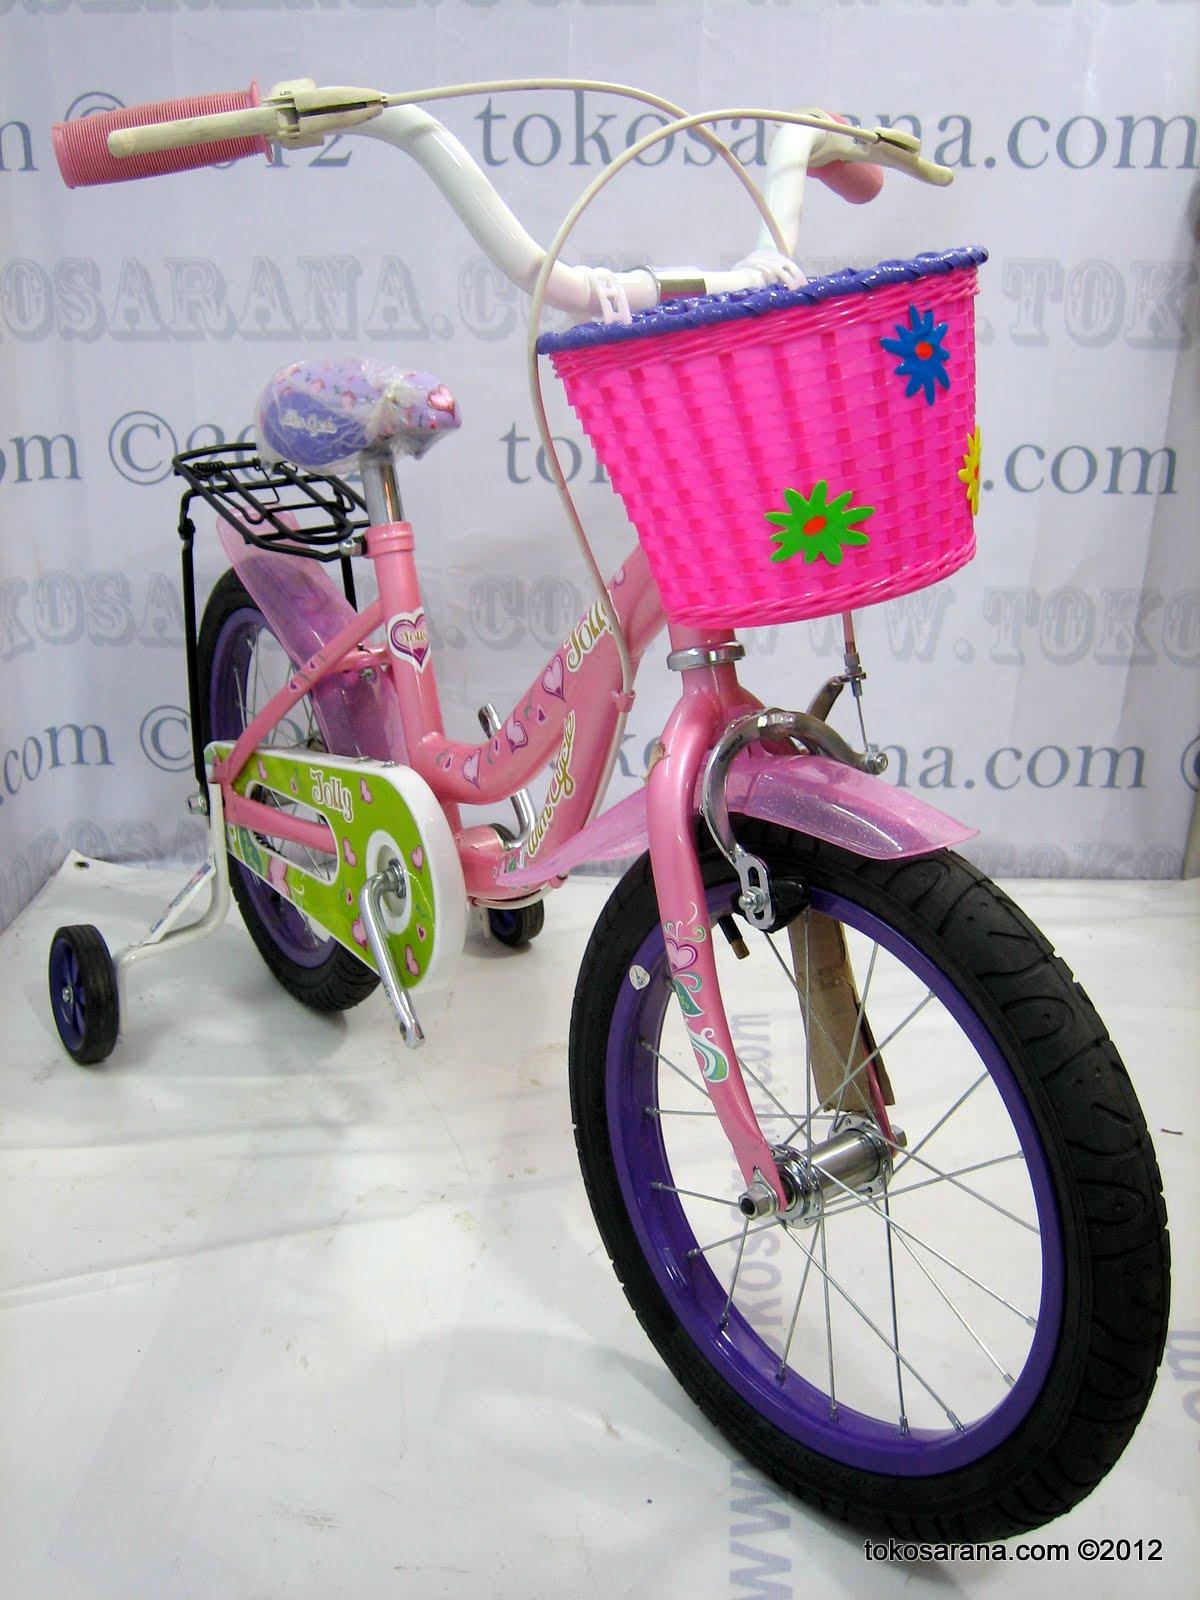 http://2.bp.blogspot.com/-4deAnbyx-TA/T2LuF0Ujd5I/AAAAAAAAPyI/yoKfon8cVYk/s1600/16+wimcycle+jolly+special+edition+%25284%2529.JPG